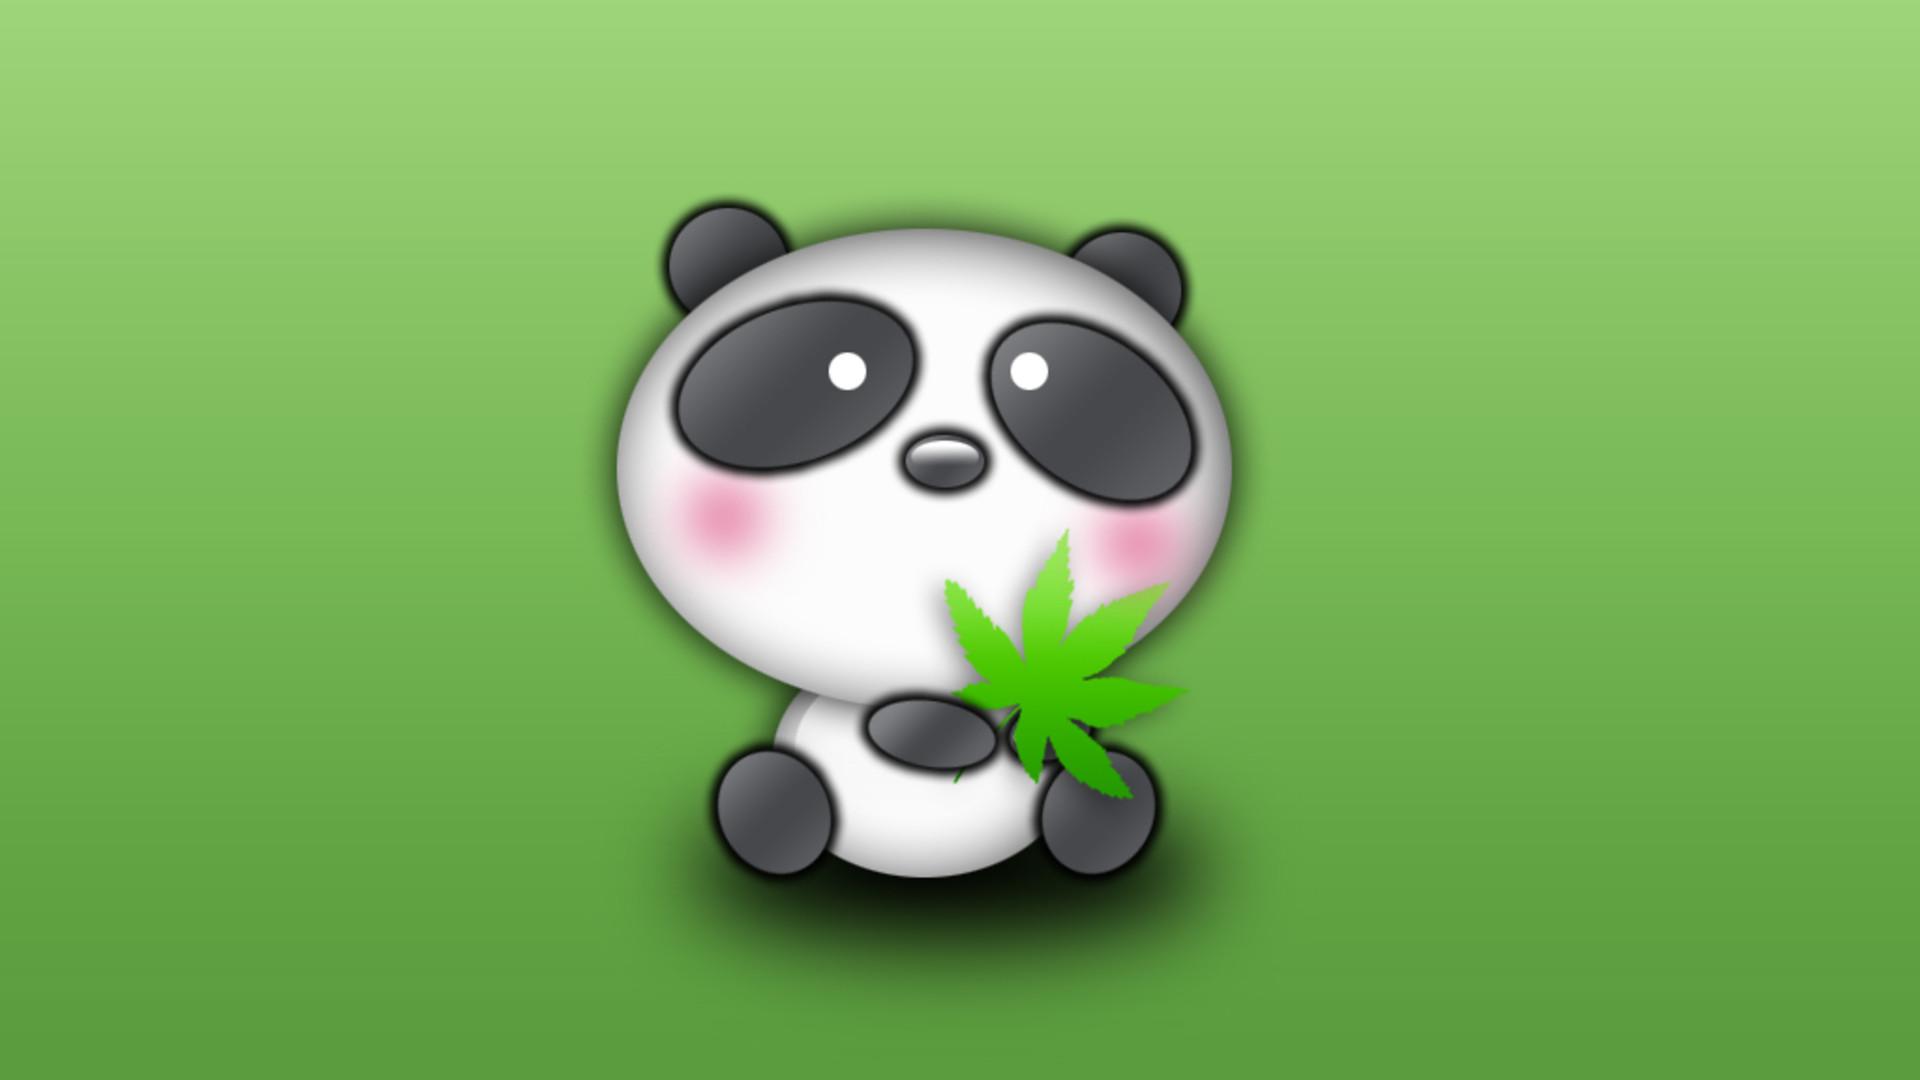 Panda Wallpaper Panda Wallpaper Panda Wallpaper …